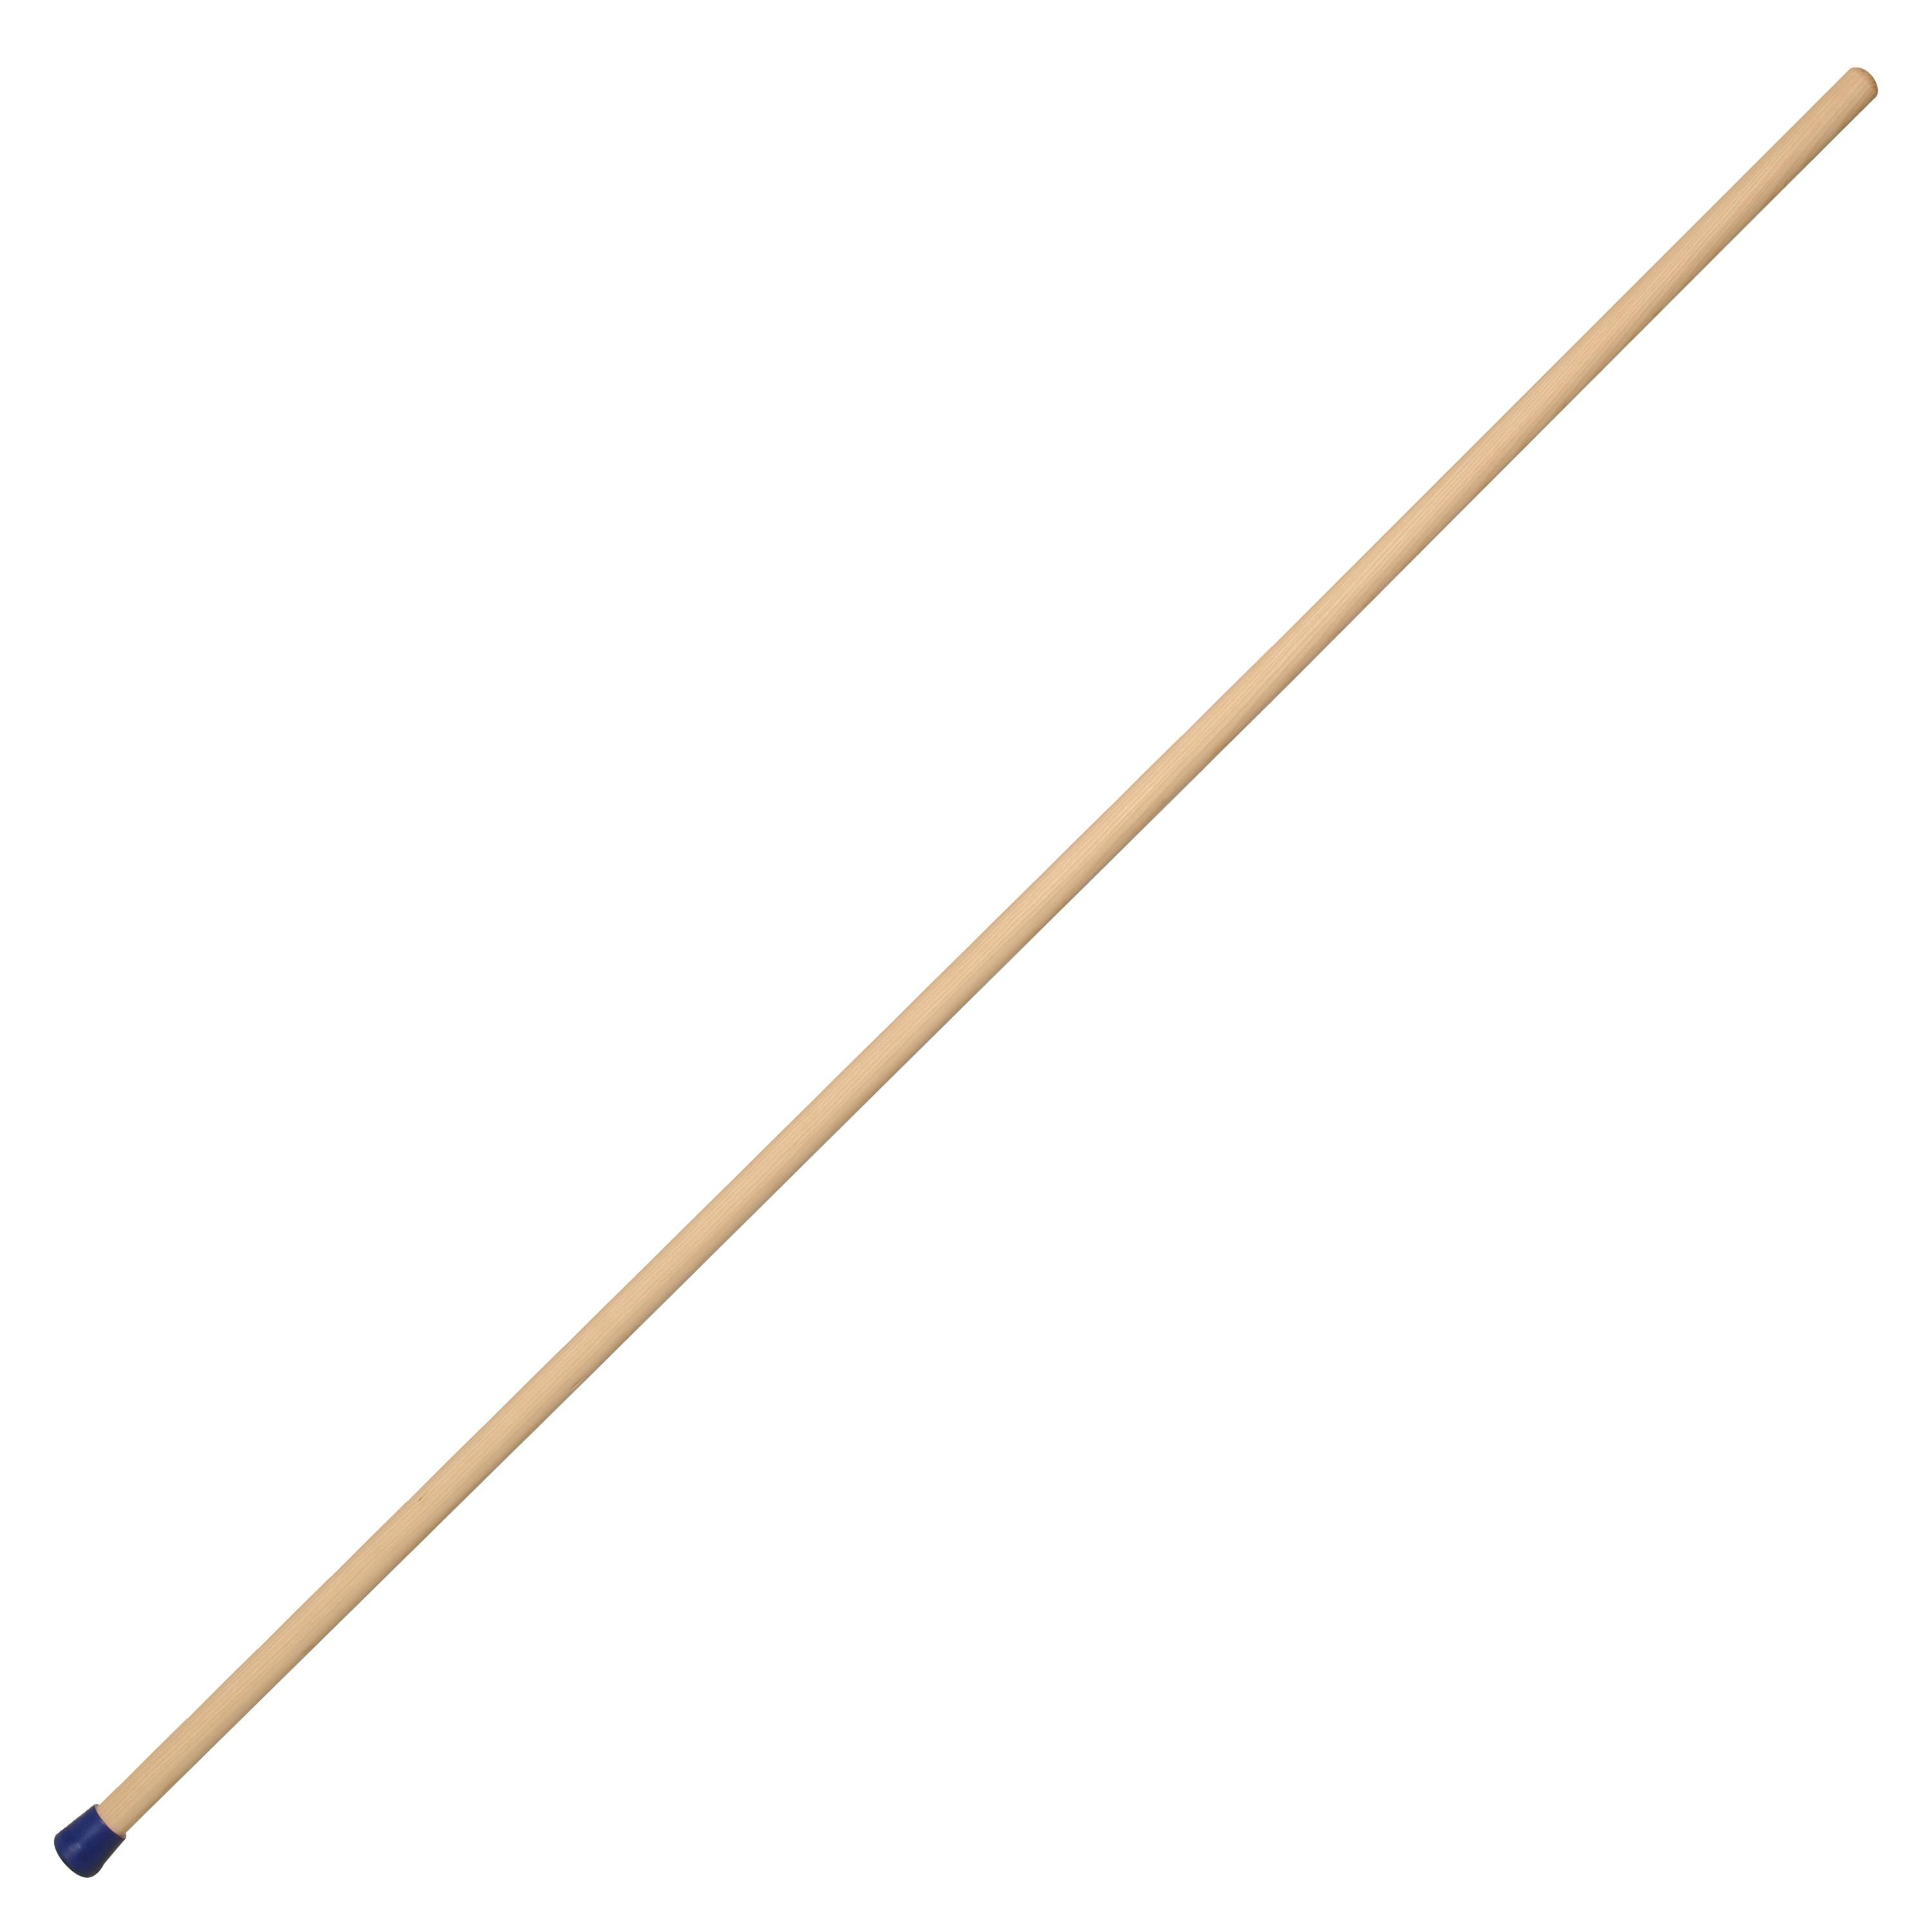 Sport-Thieme® Wooden Vaulting Pole : *Now only... : Sport-Thieme.co.uk